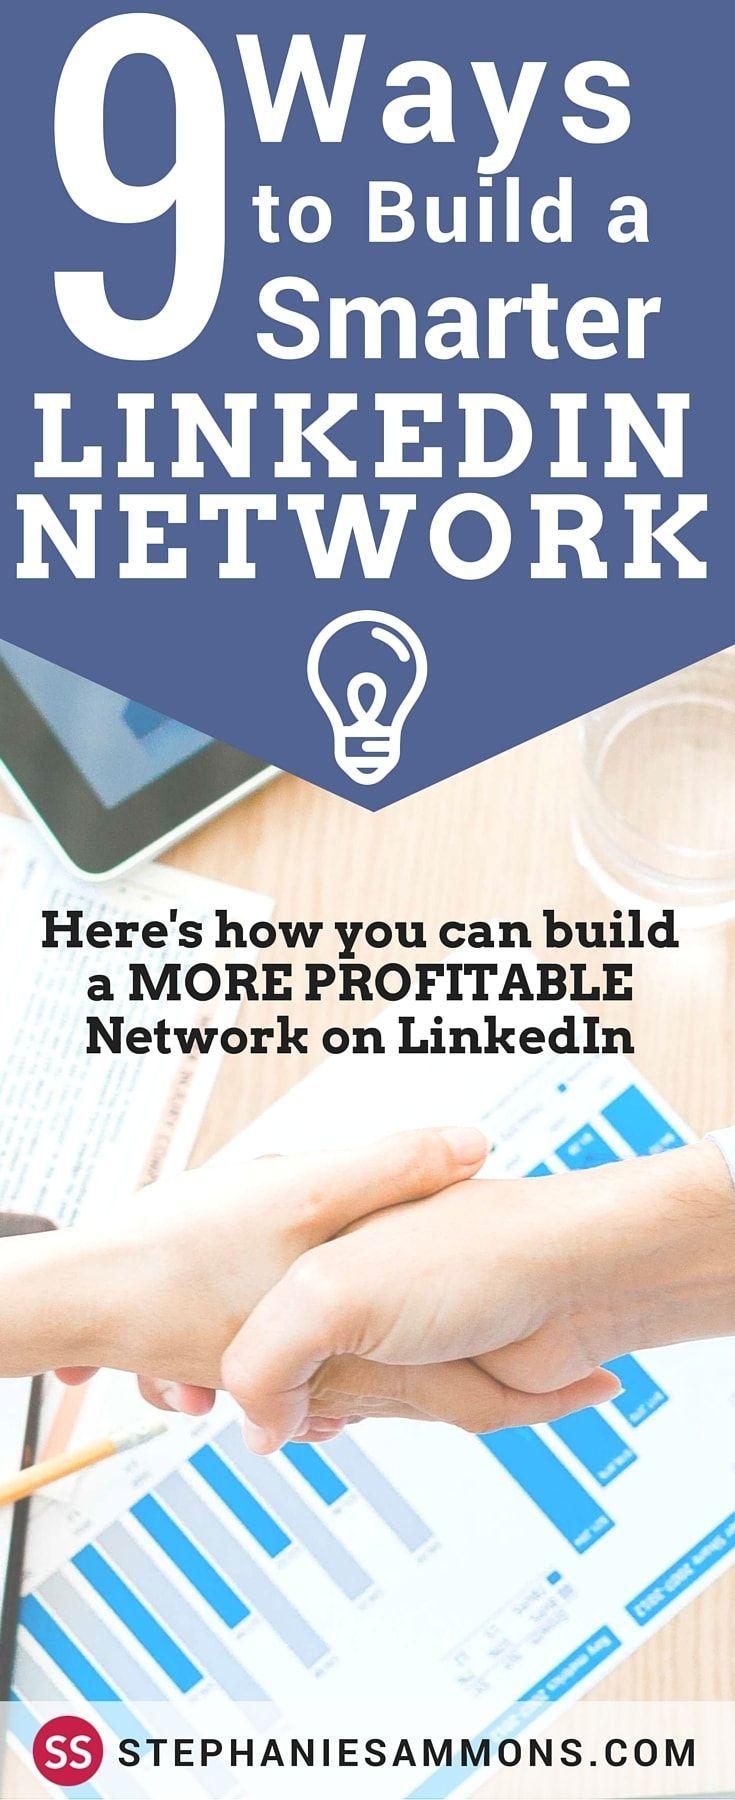 best ideas about linkedin network linkedin com how to build a smarter linkedin network